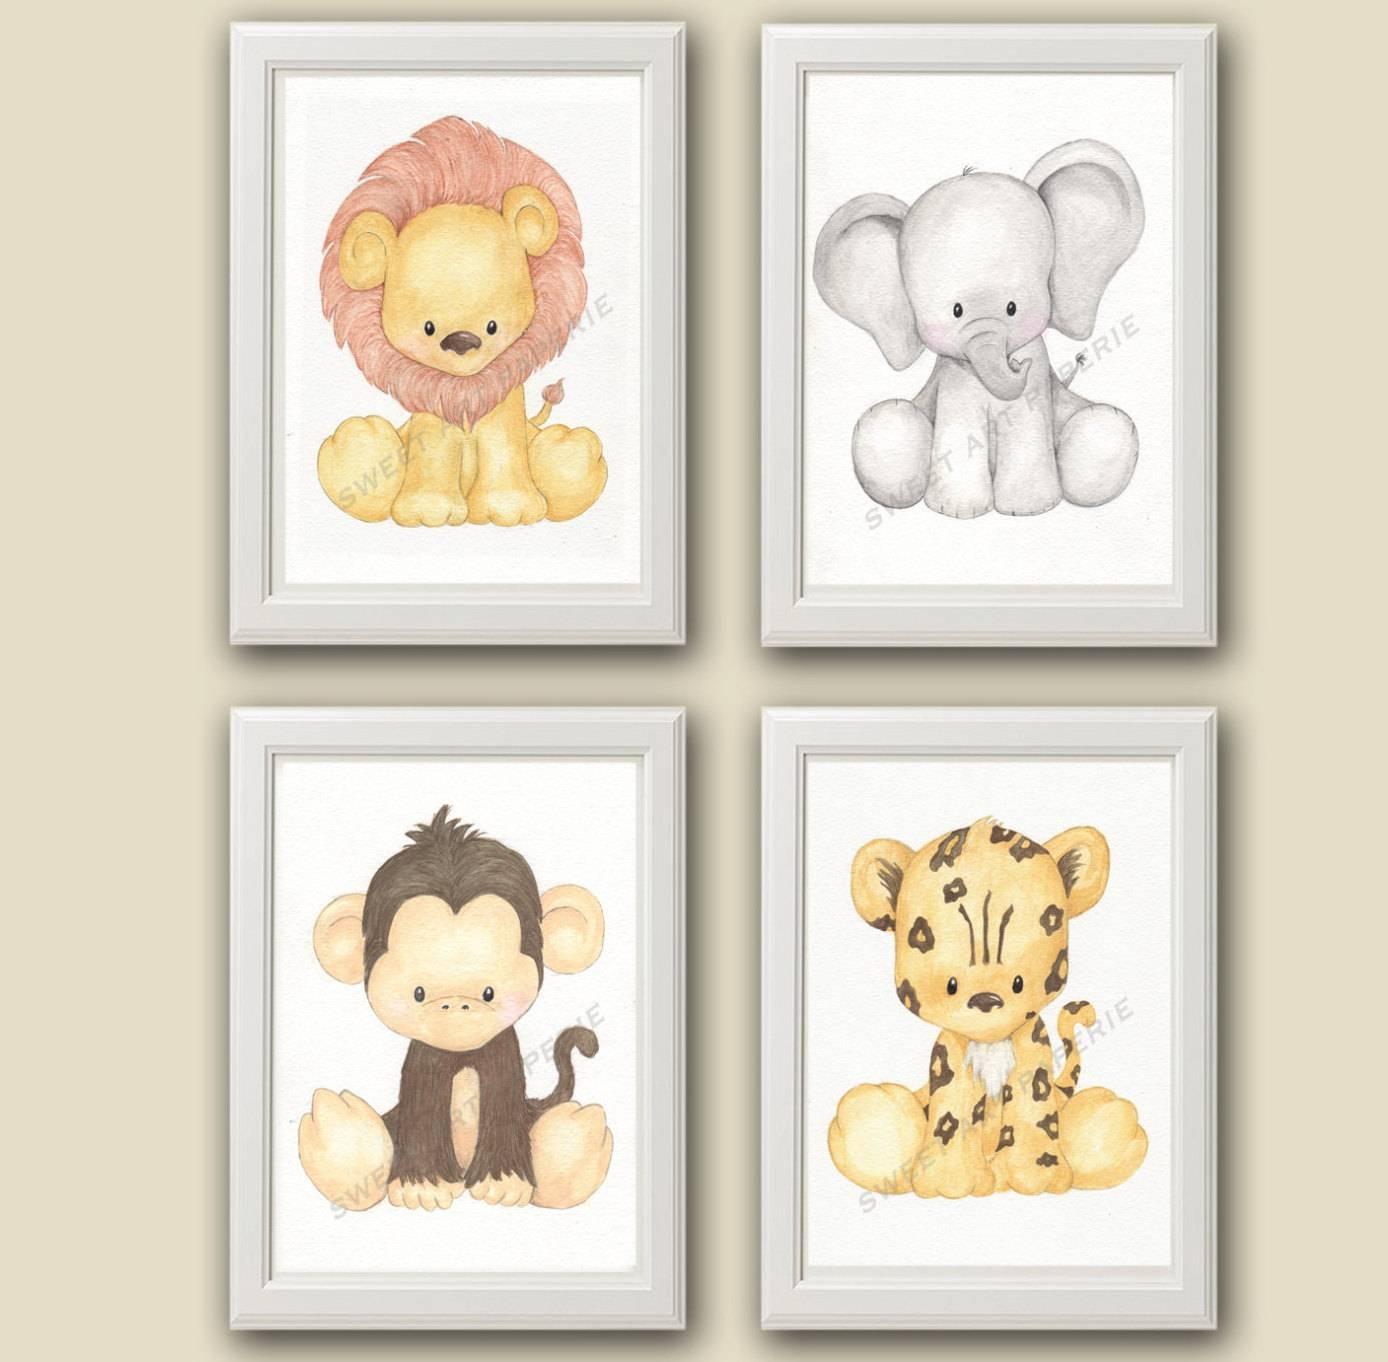 Zoo Nursery Art Nursery Decor Set Of 4 Prints Zoo With Most Up To Date Animal Wall Artfor Nursery (View 5 of 20)